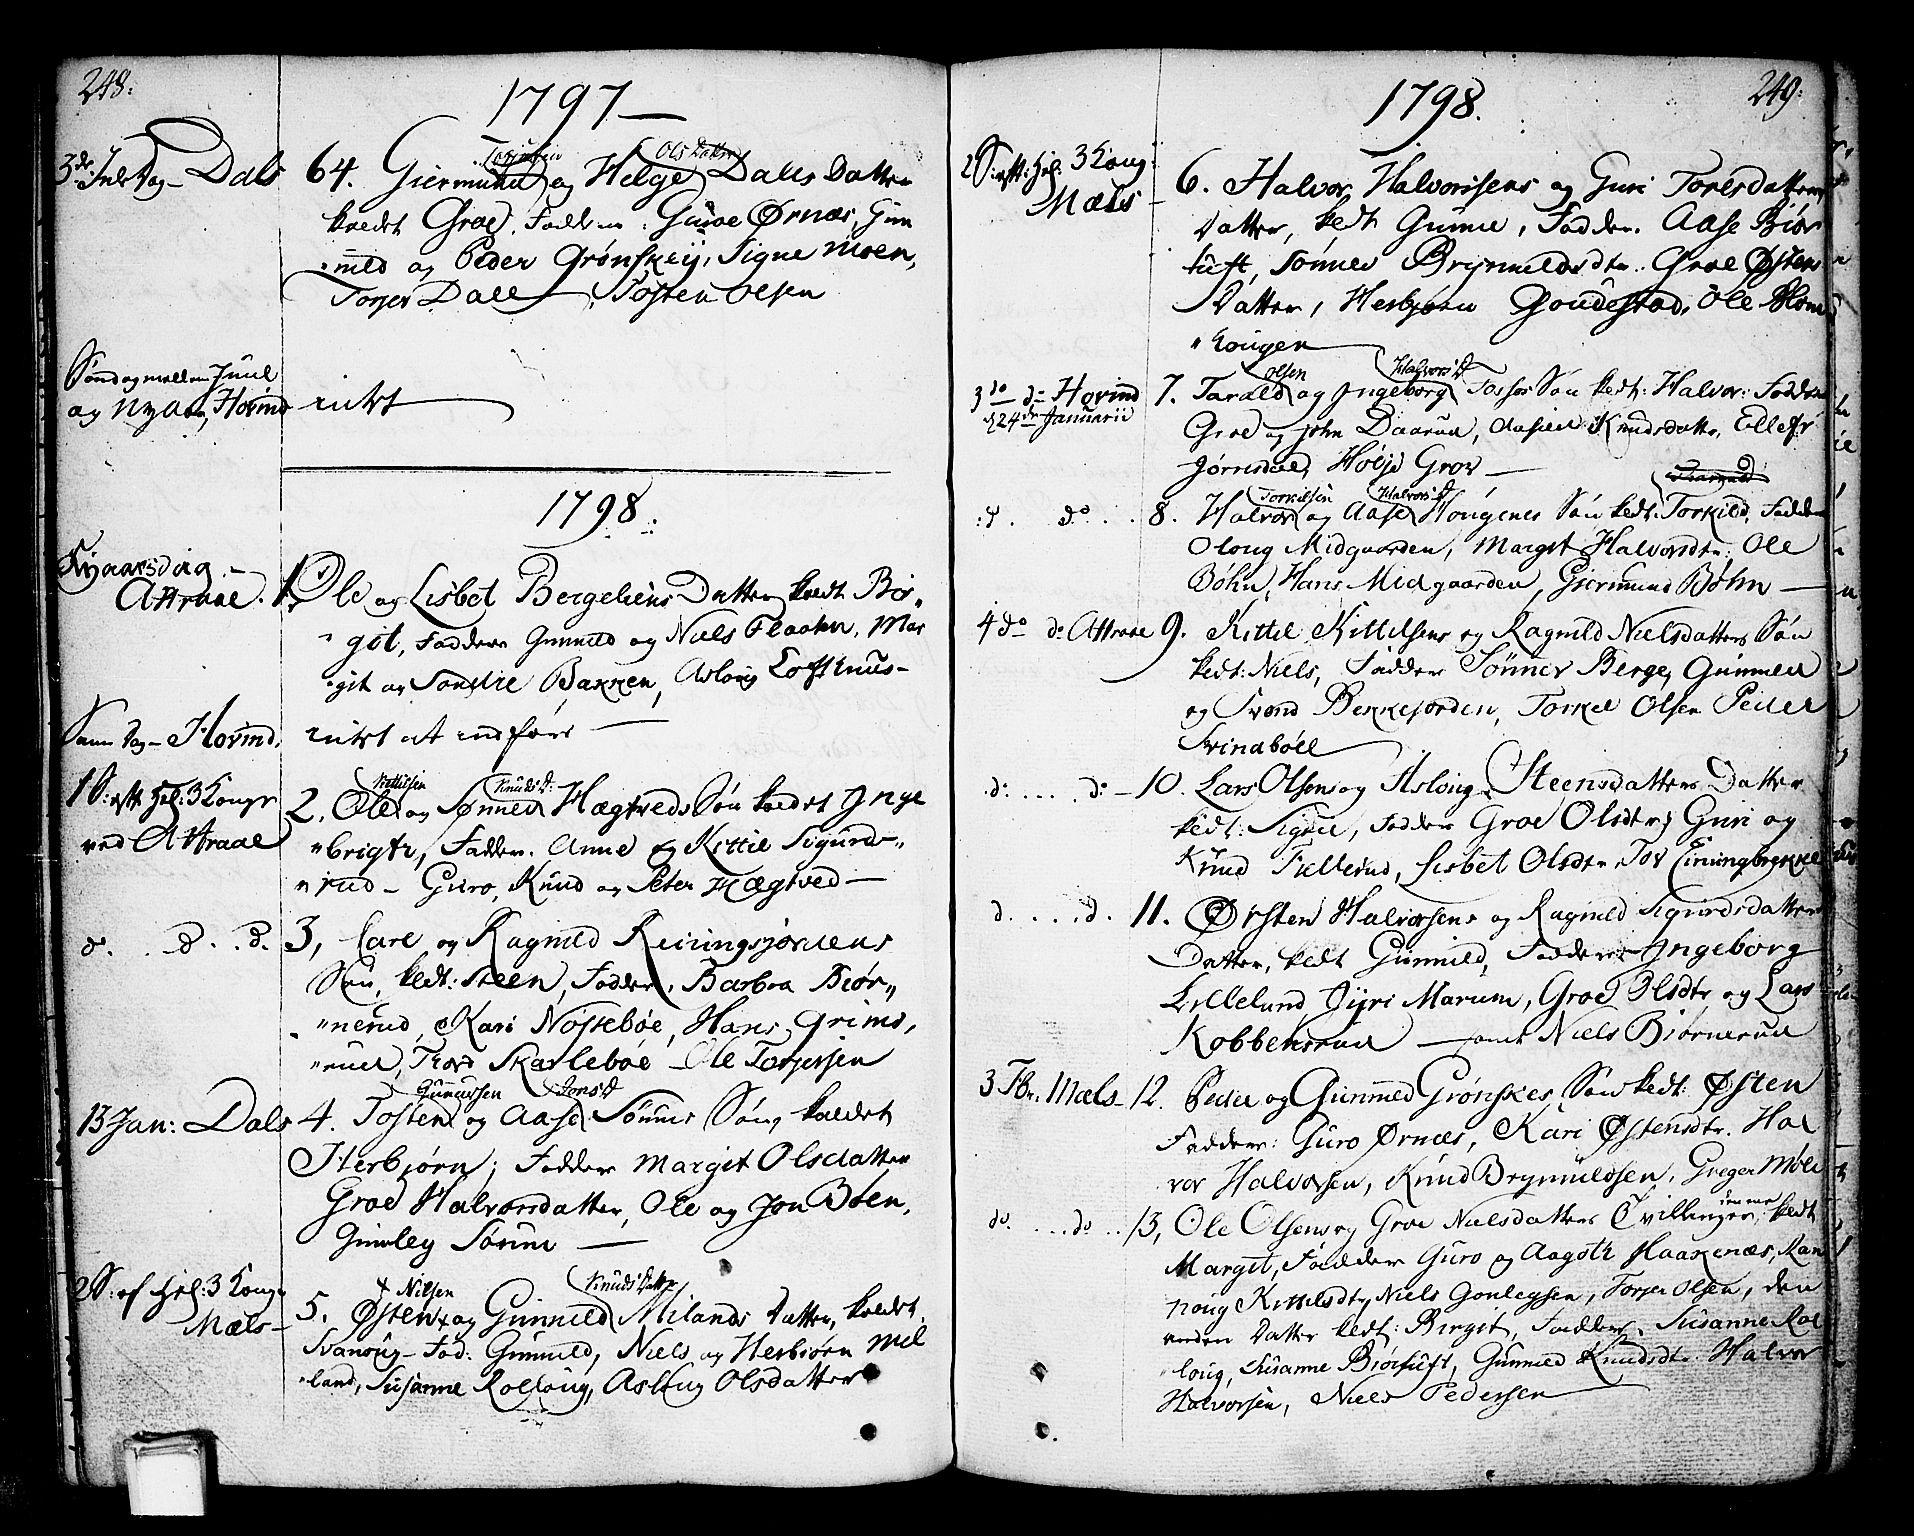 SAKO, Tinn kirkebøker, F/Fa/L0002: Ministerialbok nr. I 2, 1757-1810, s. 248-249